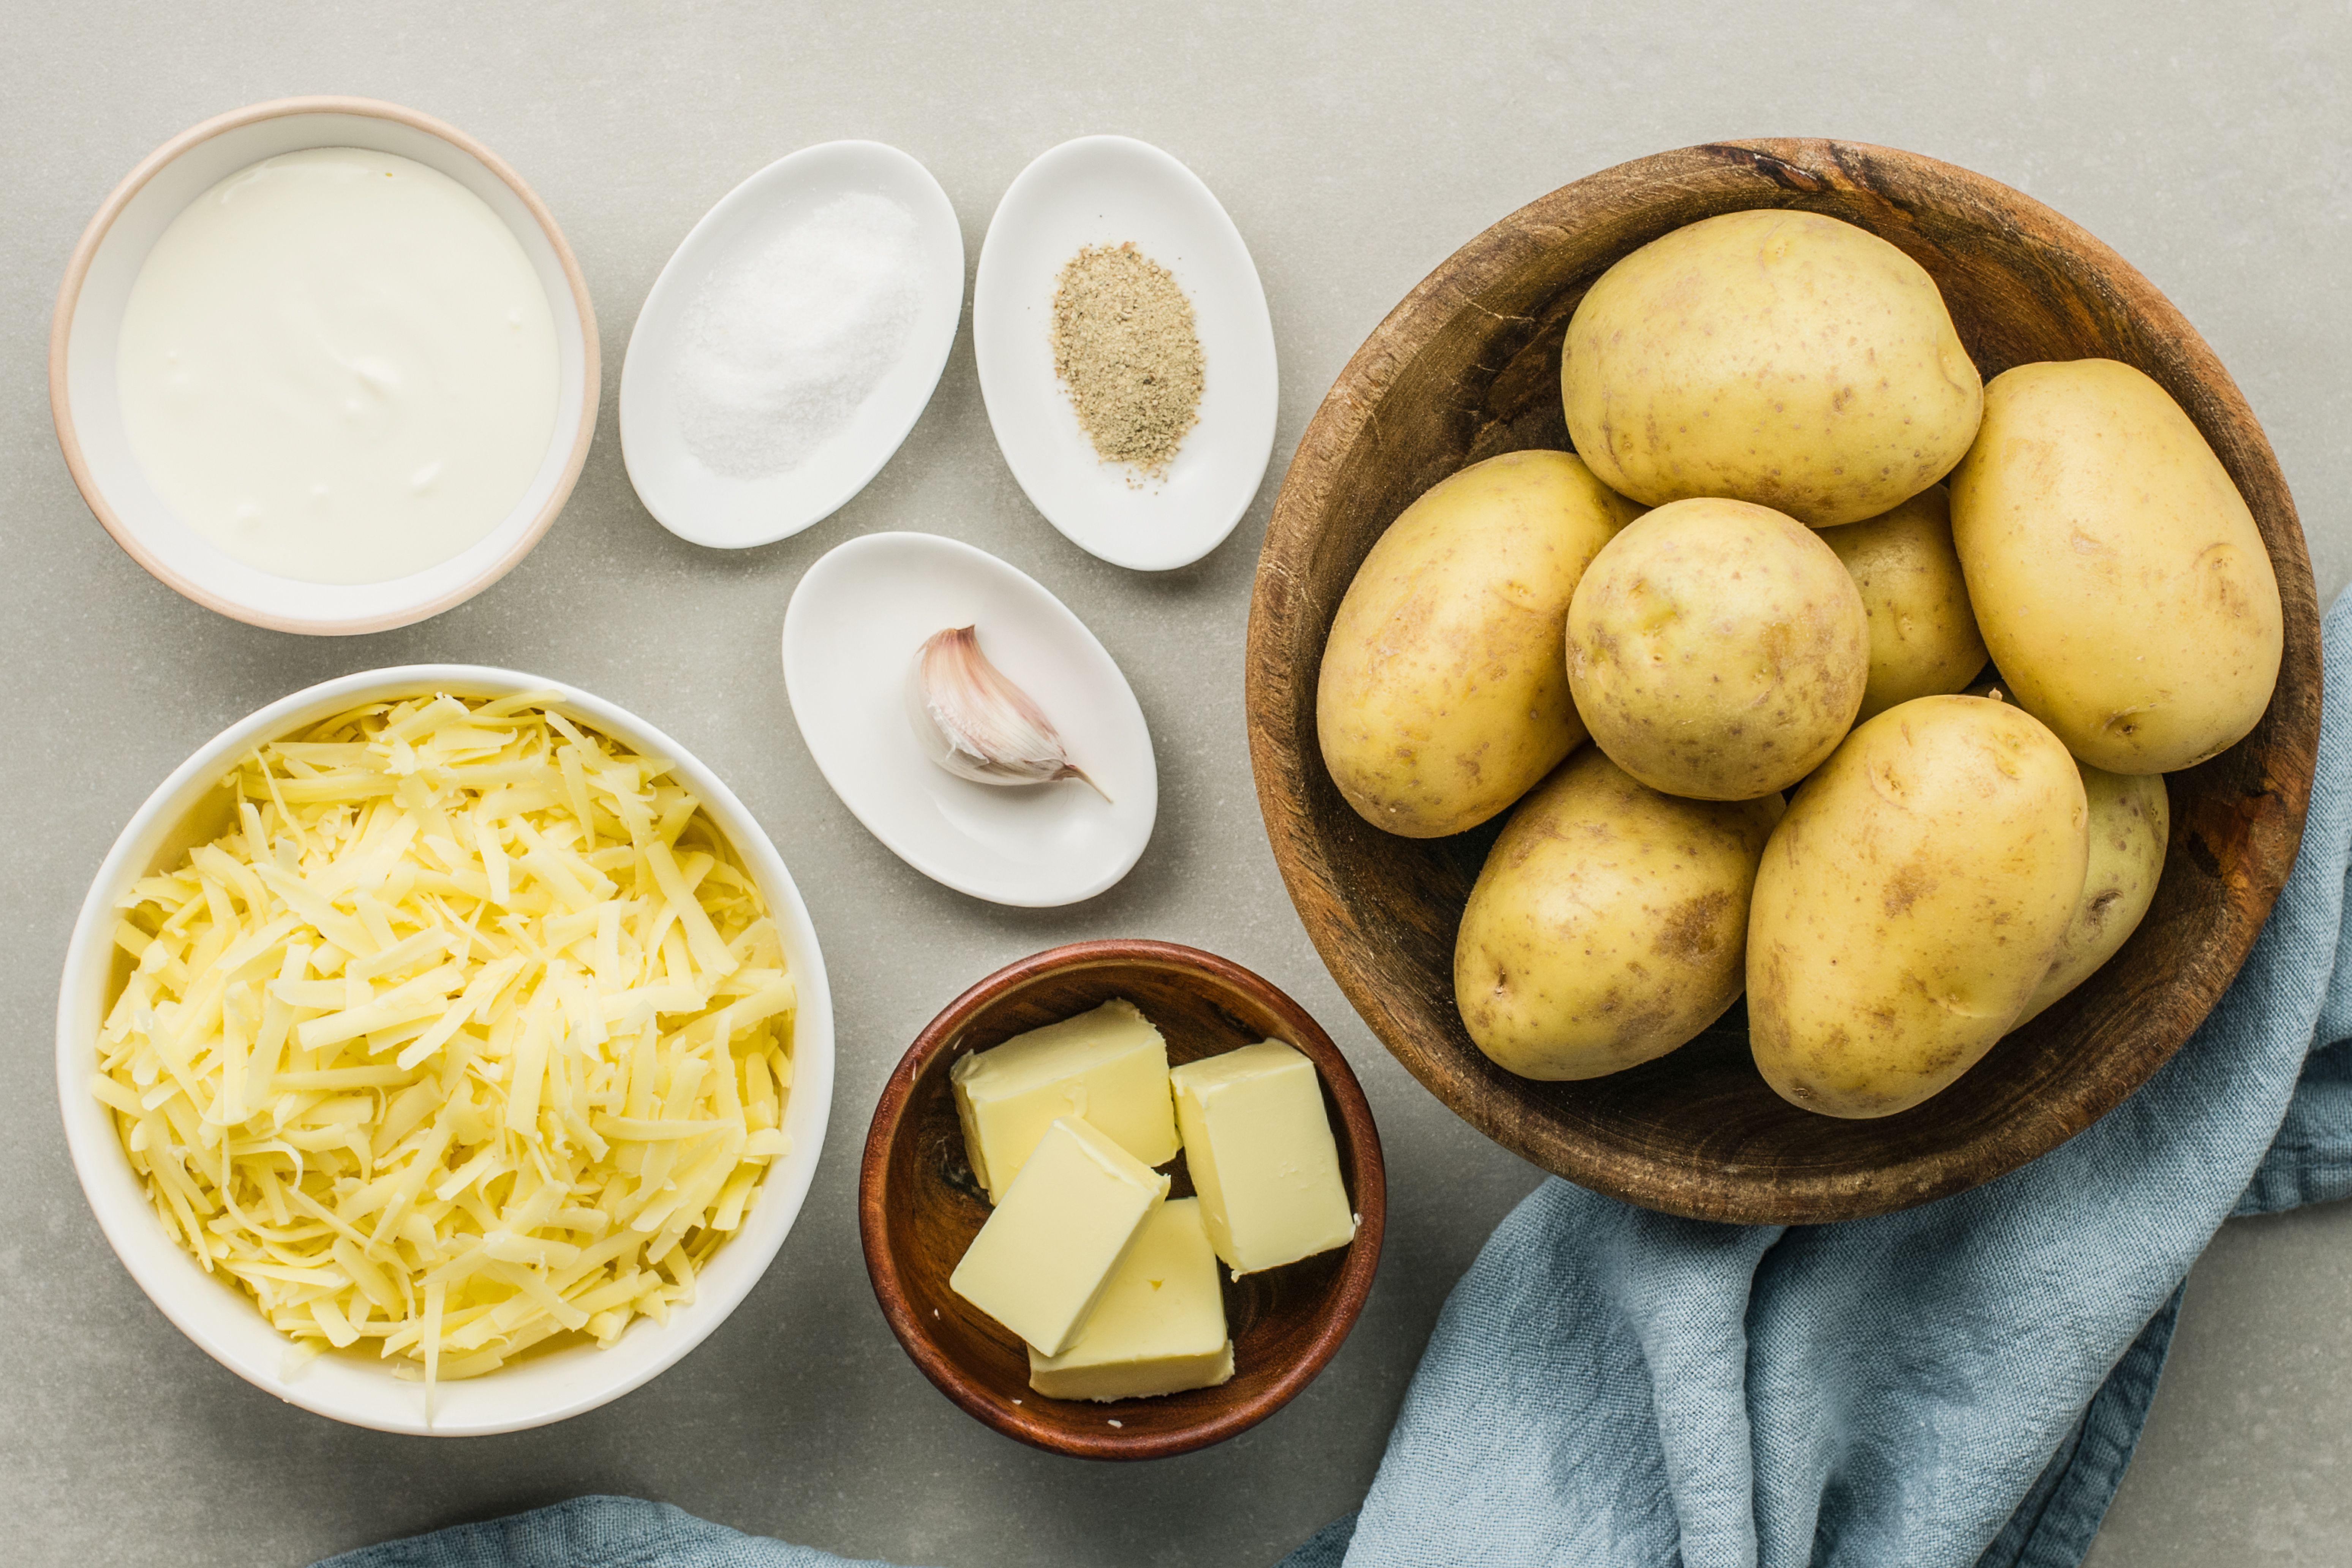 Classic French aligot ingredients